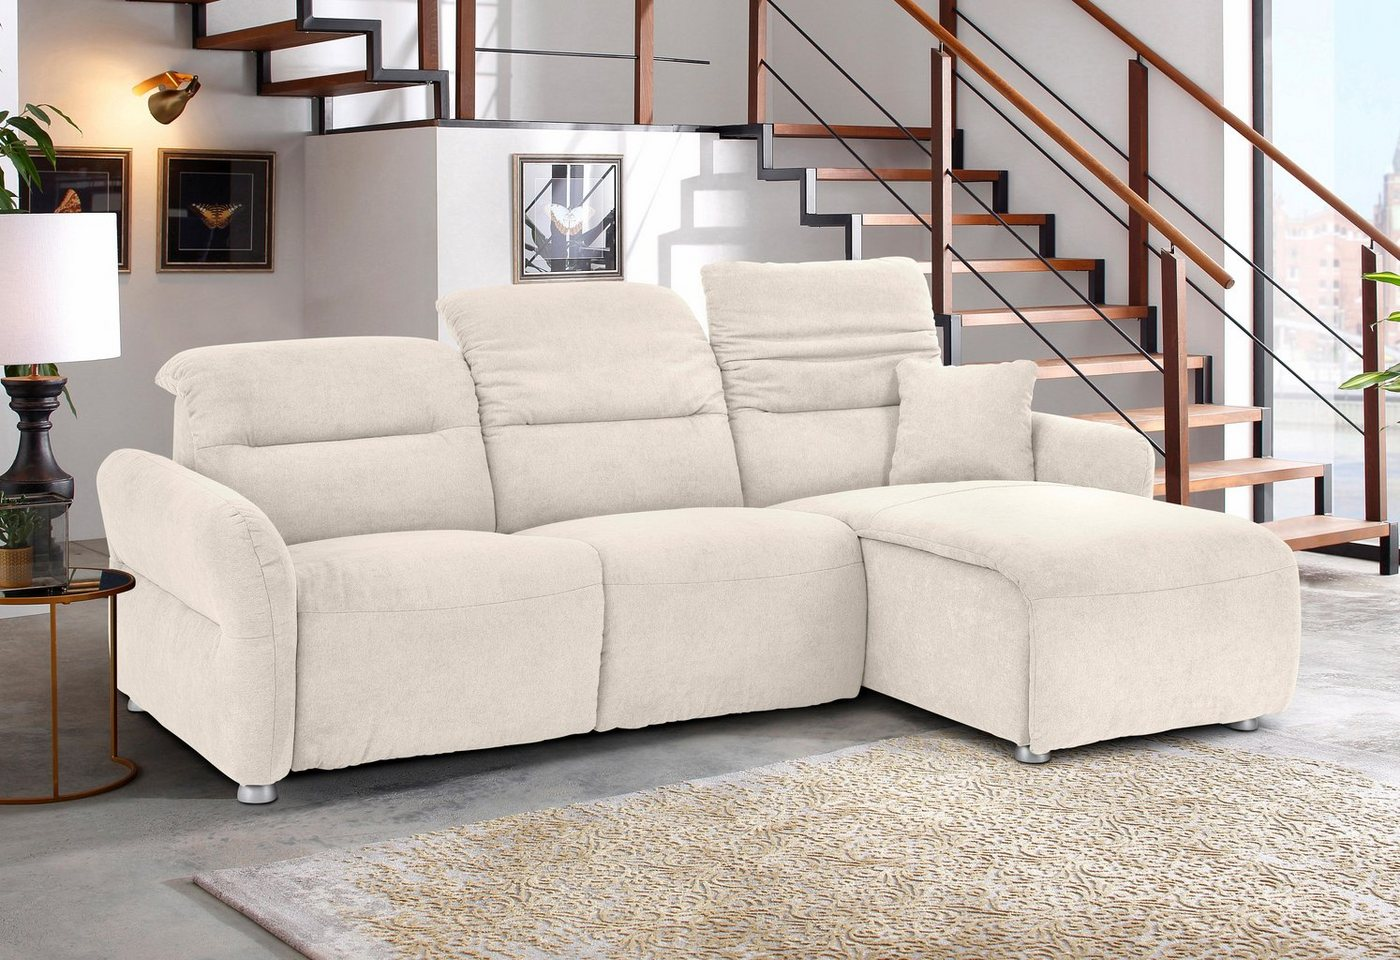 mit relaxfunktion sonstige preisvergleiche. Black Bedroom Furniture Sets. Home Design Ideas